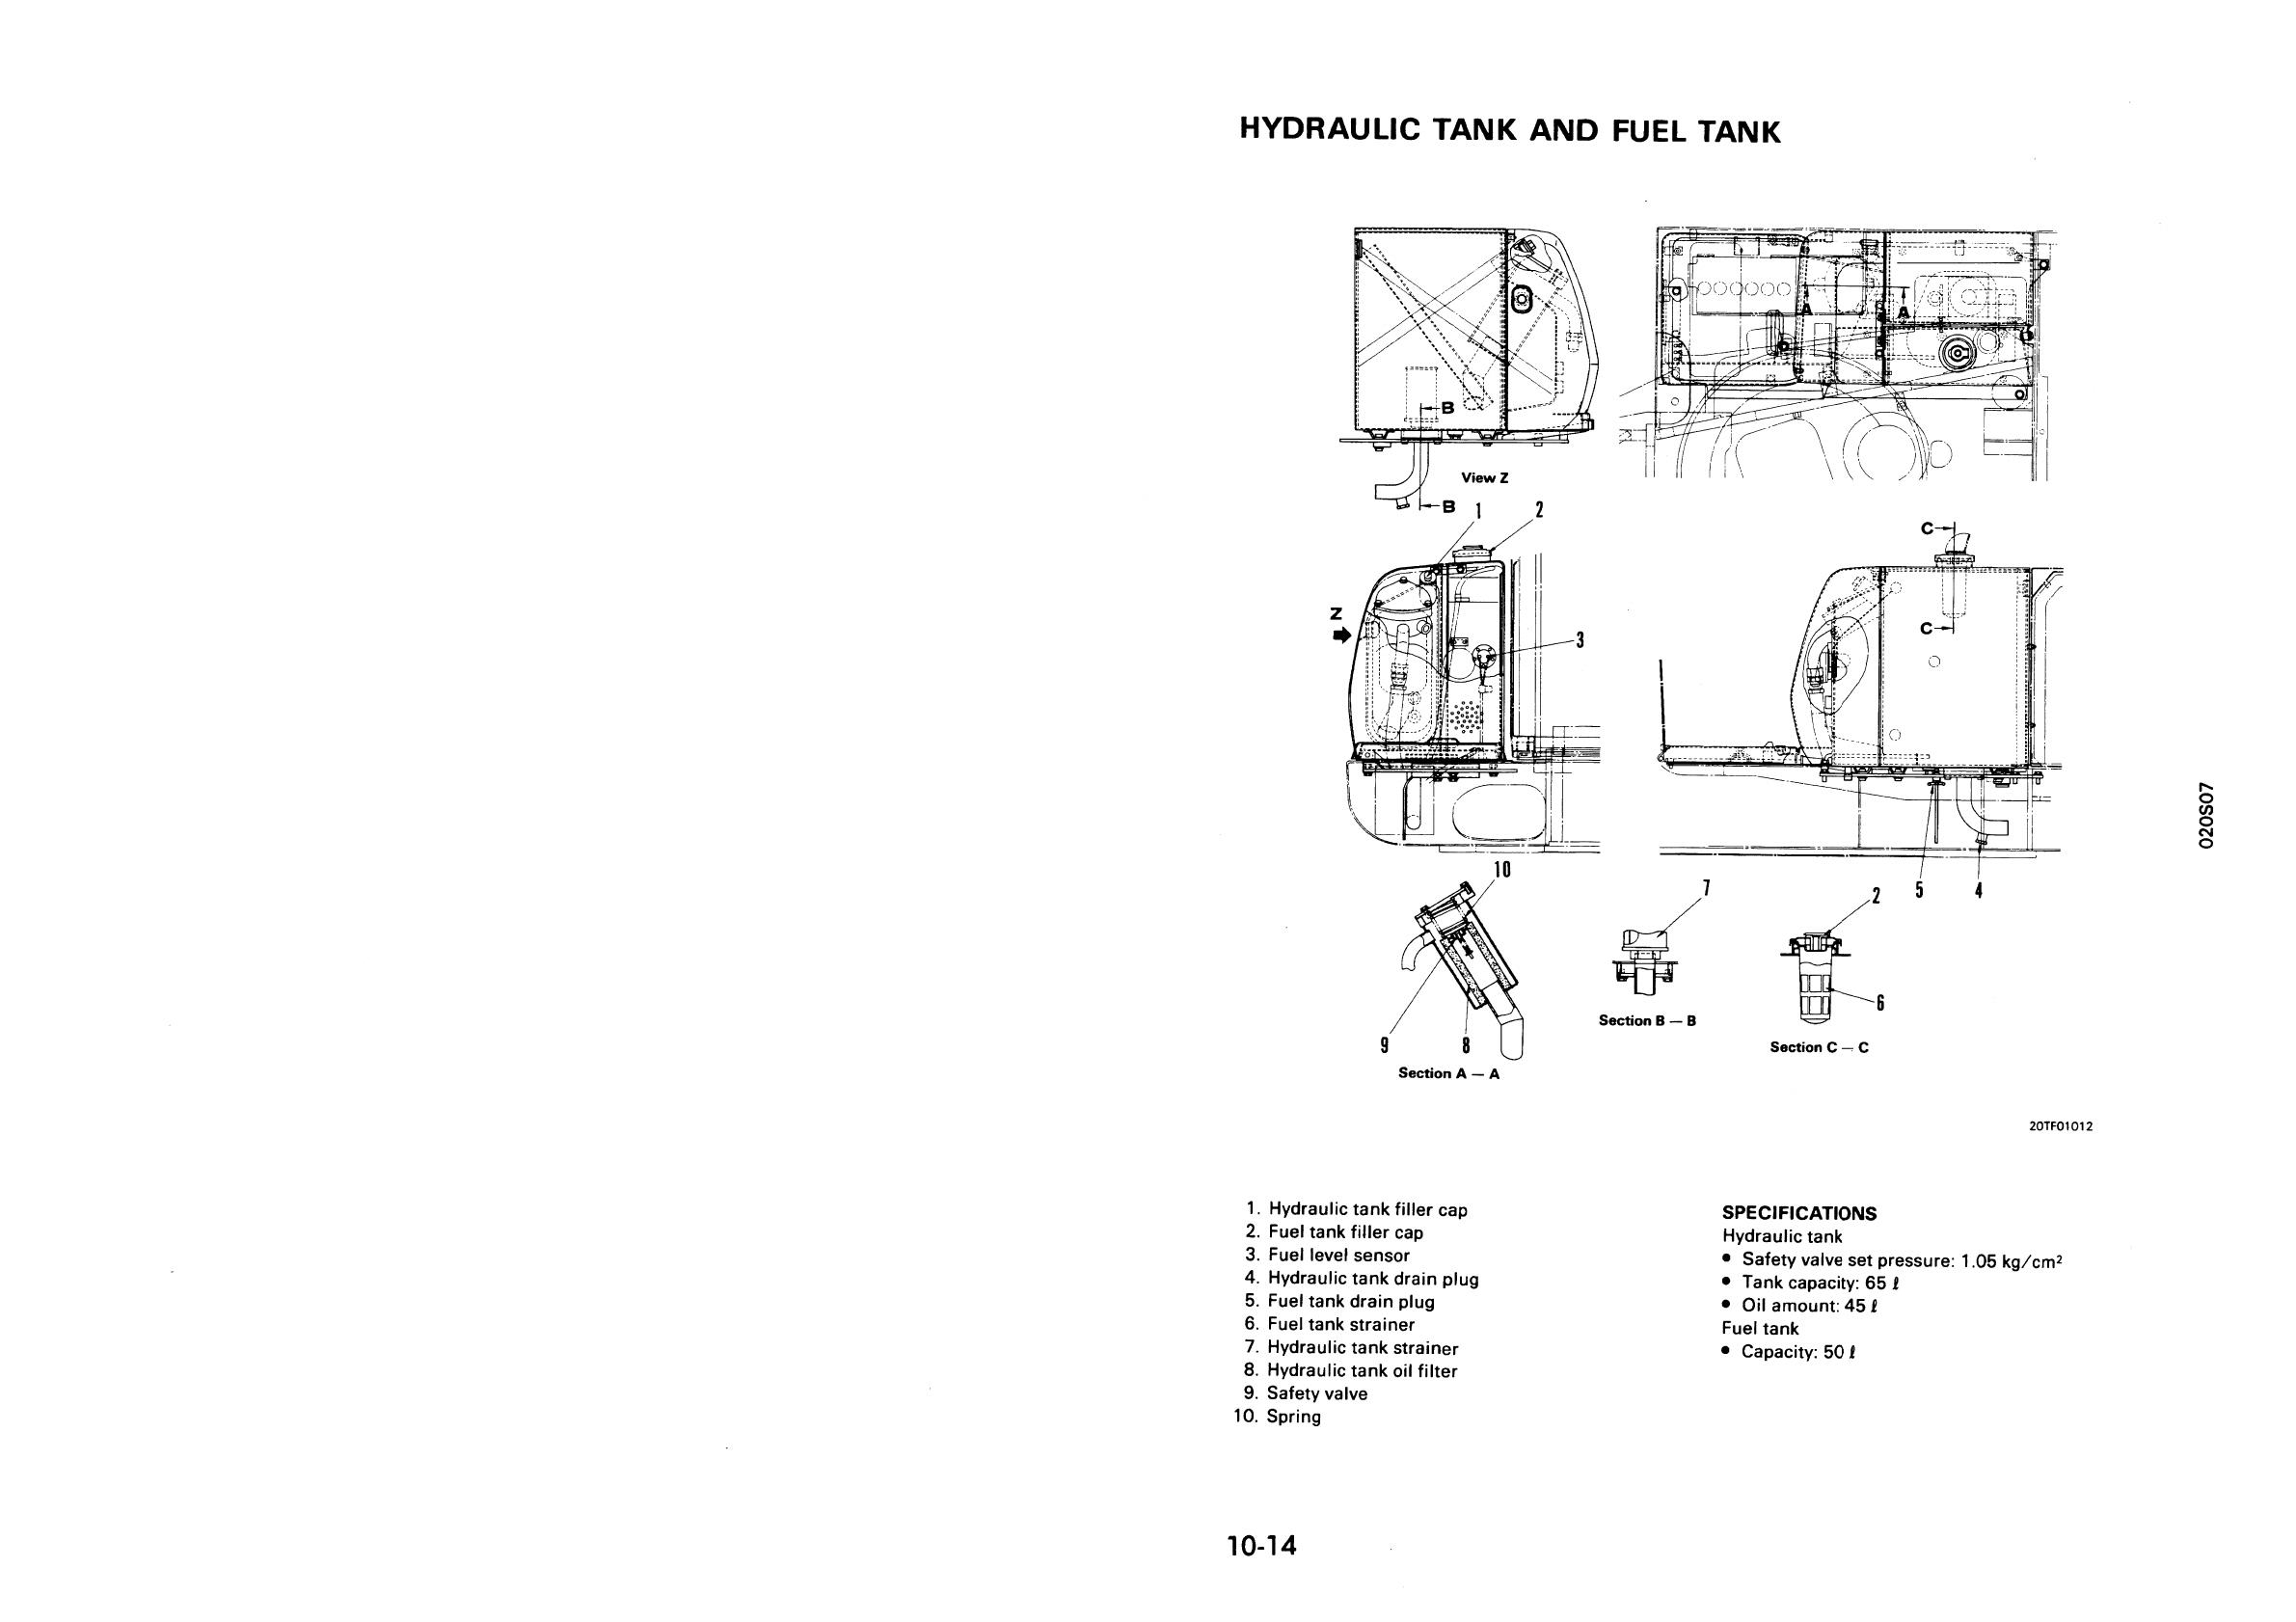 Sebd020s0707 Pc25 1 Pc30 7 Pc40 Pc45 Hydraulic Excavator Fuel Level Gauge Schematic 20